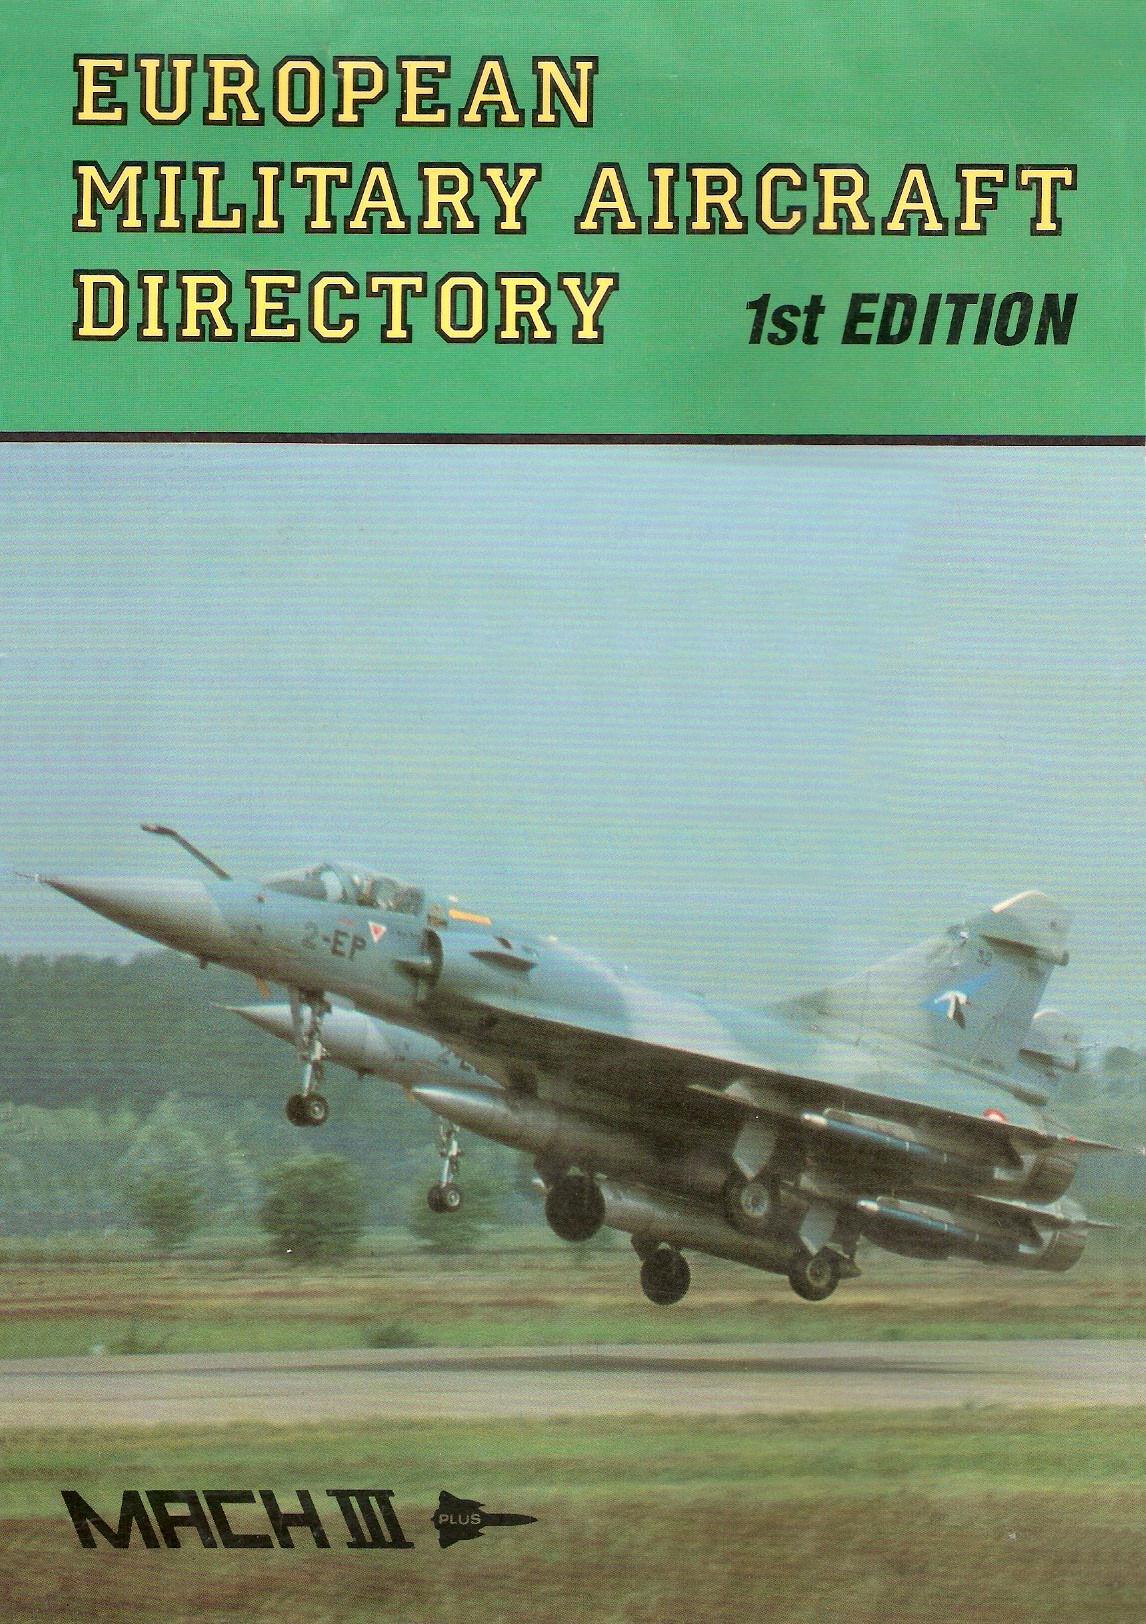 European Military Aircraft Directory